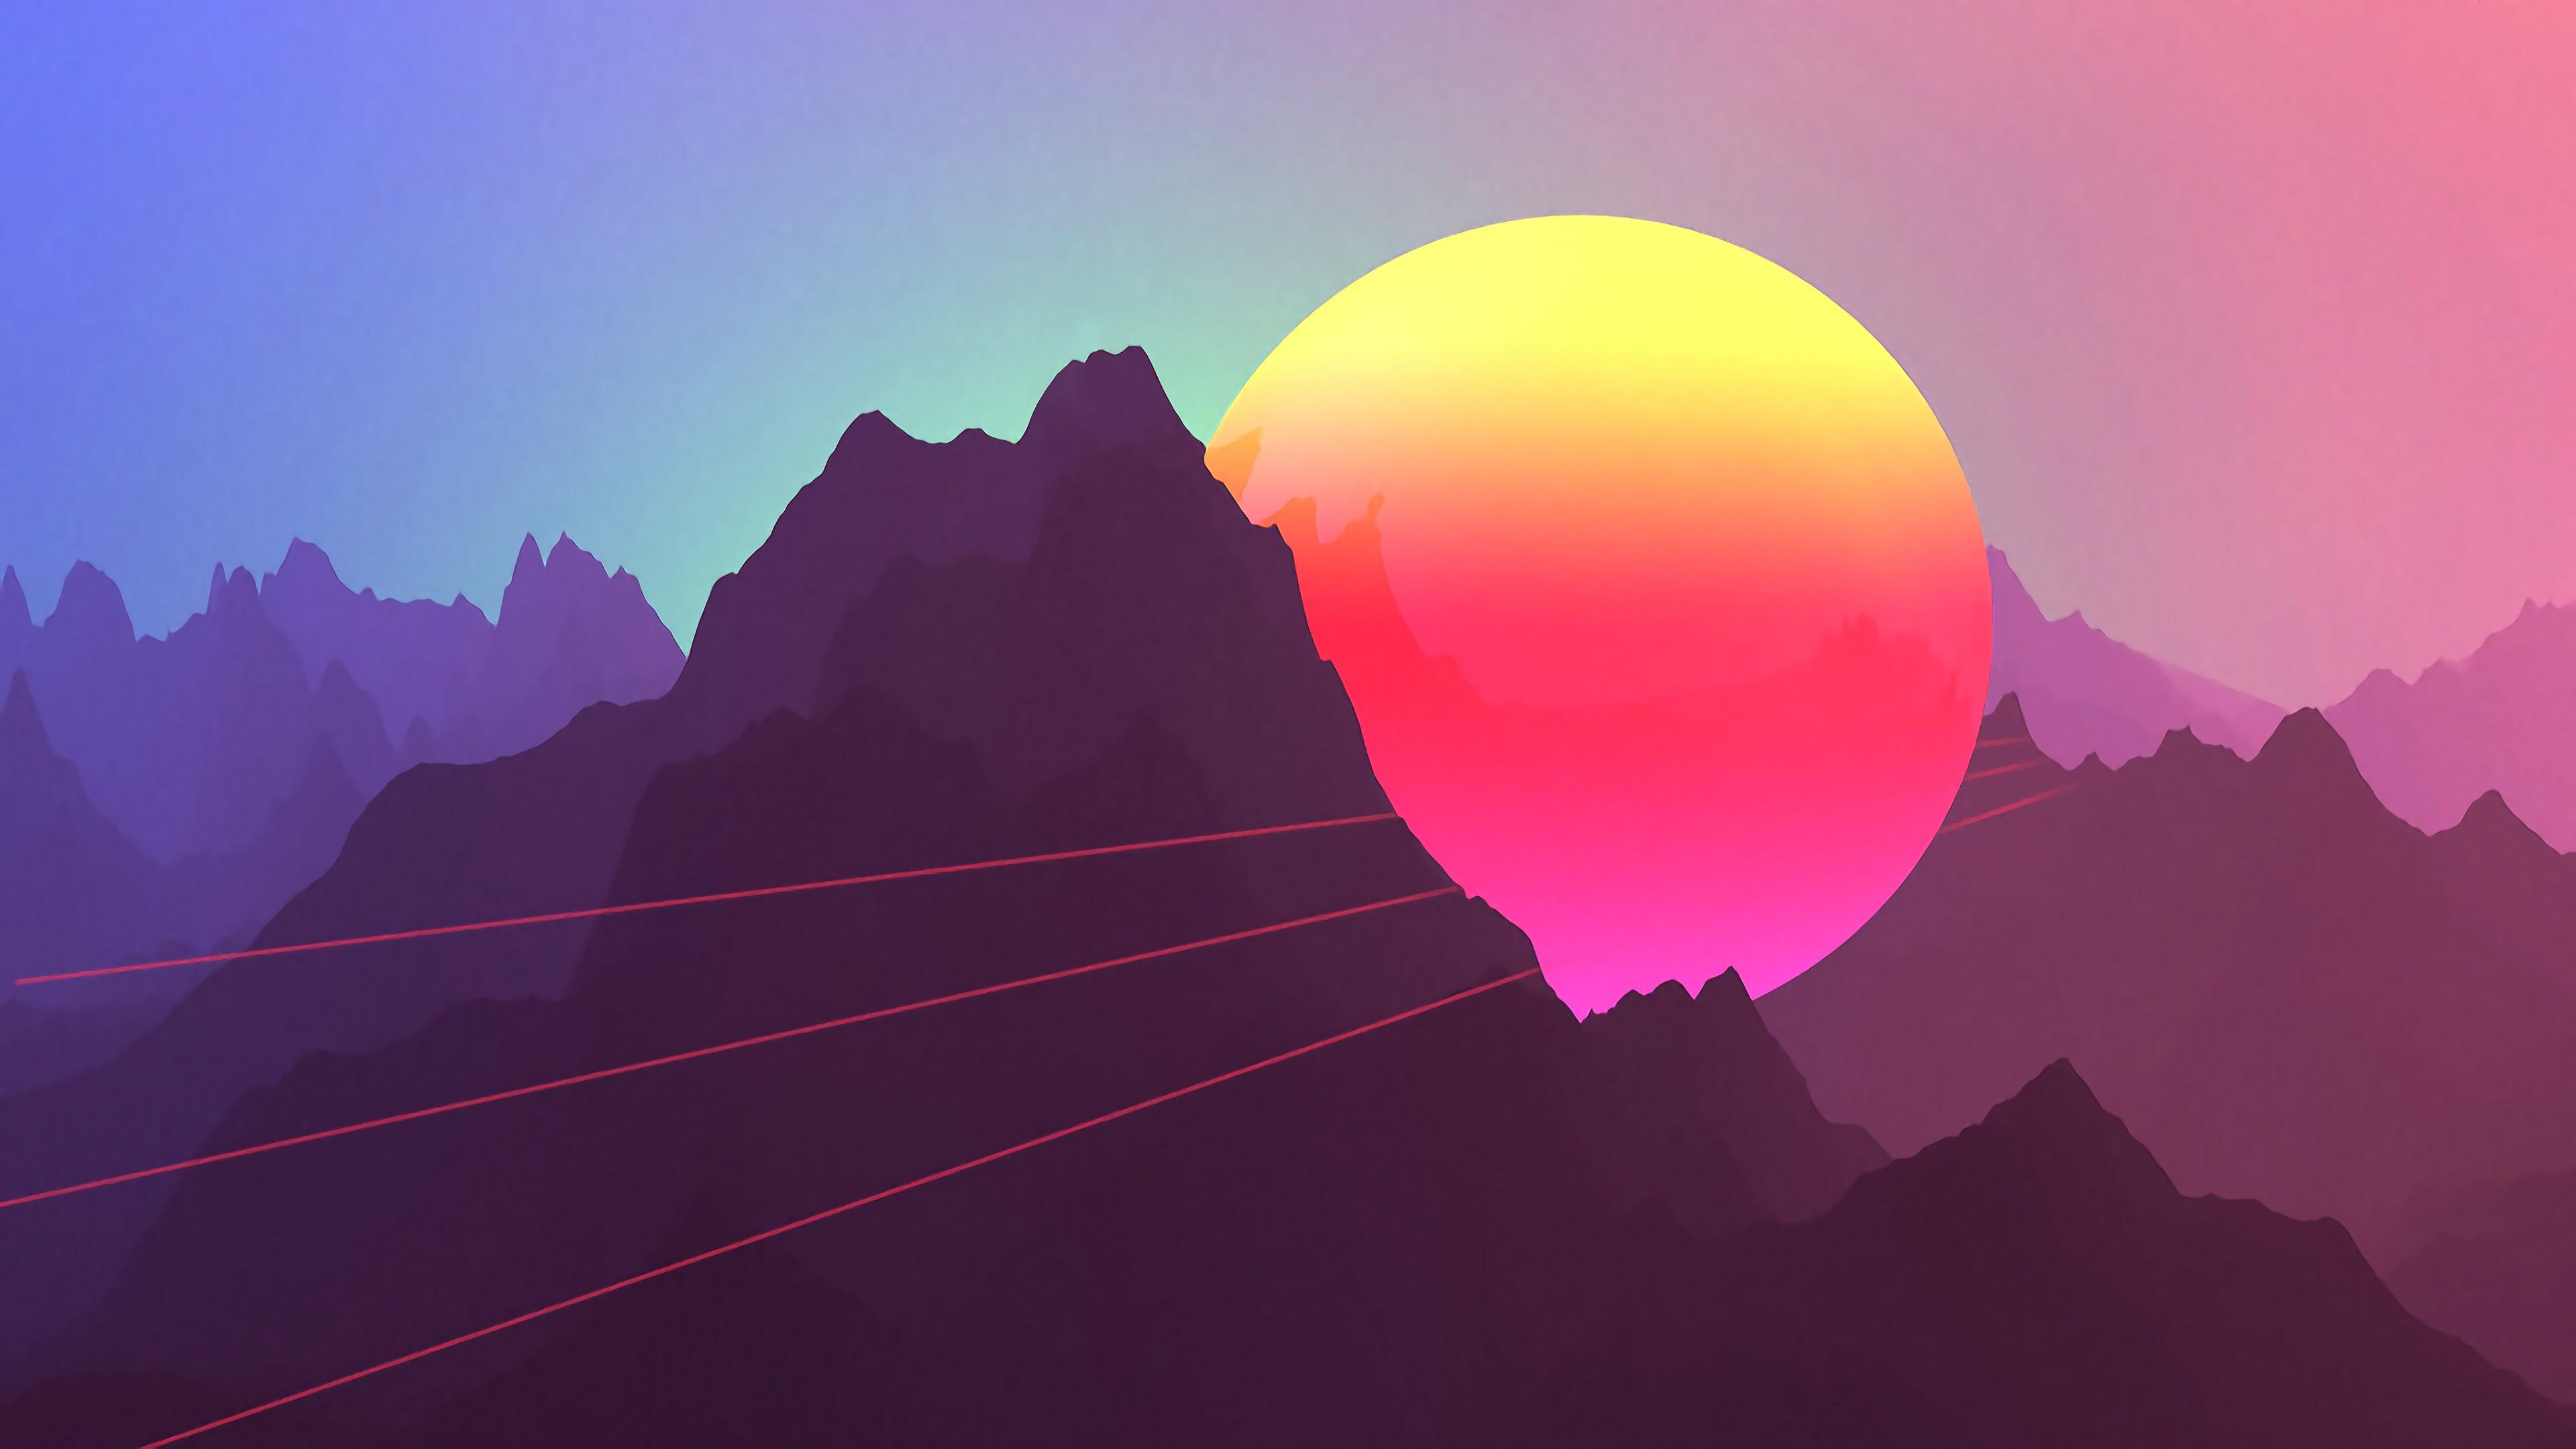 Wallpaper Neon Sunset Mountains Retro Style 3840x2160